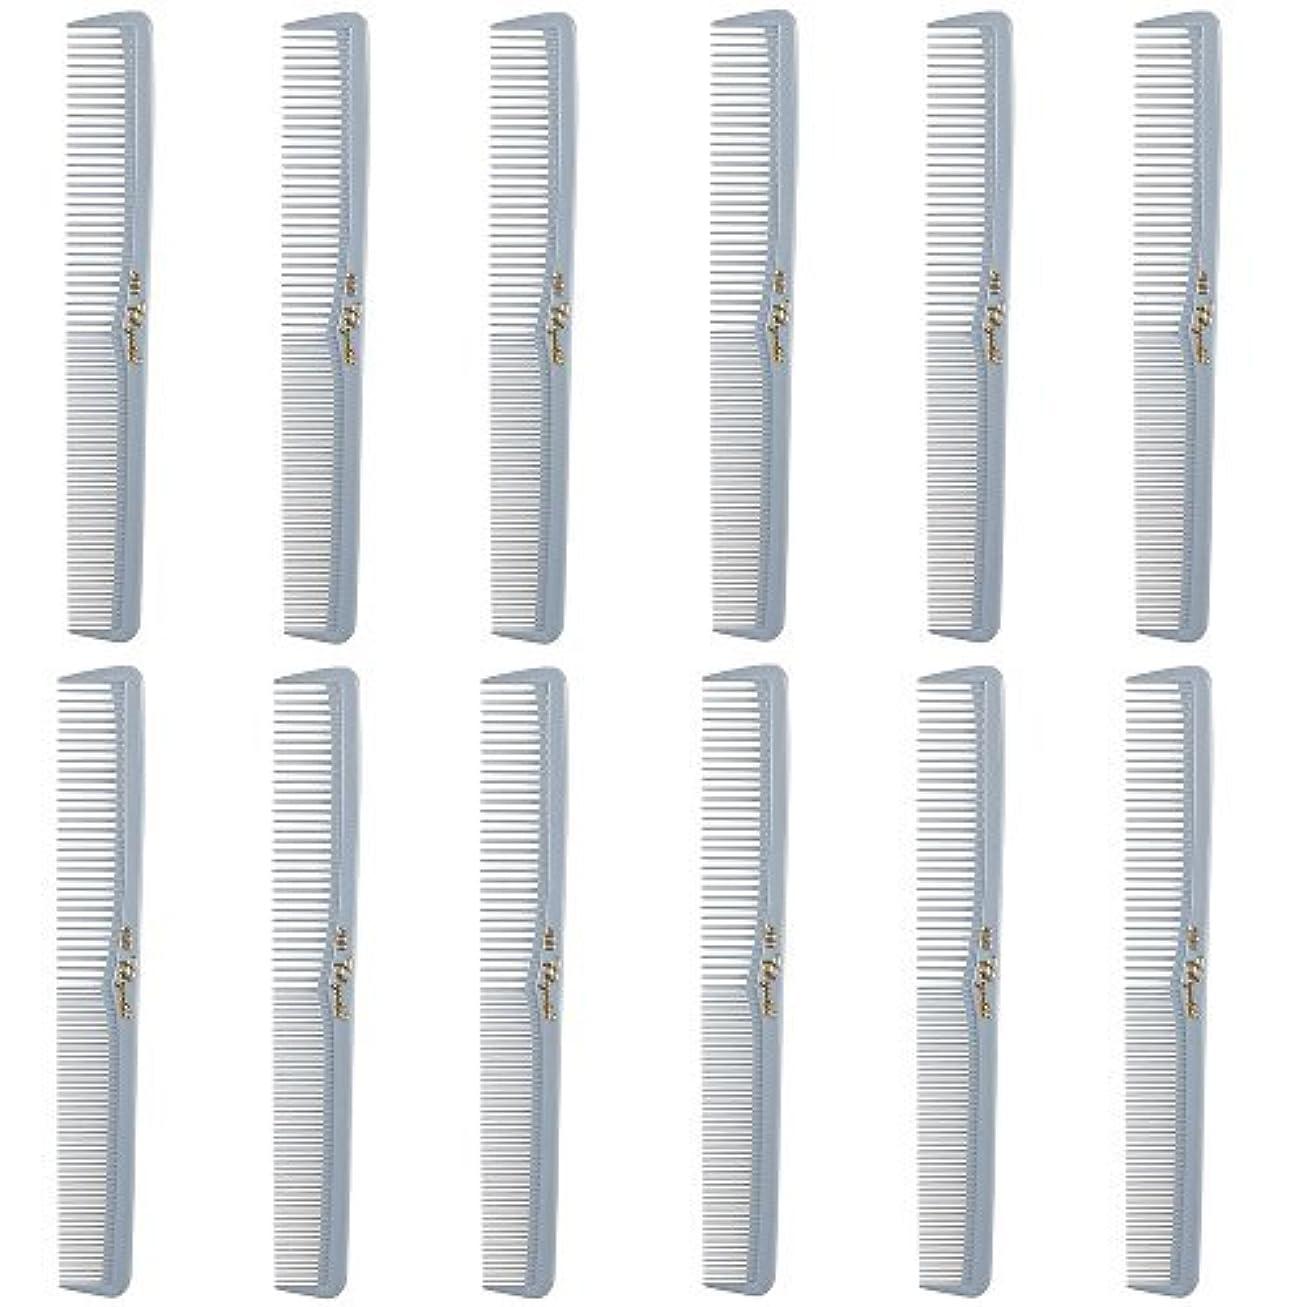 Barber Beauty Hair Cleopatra 400 All Purpose Comb (12 Pack) 12 x SB-C400-LGREY [並行輸入品]